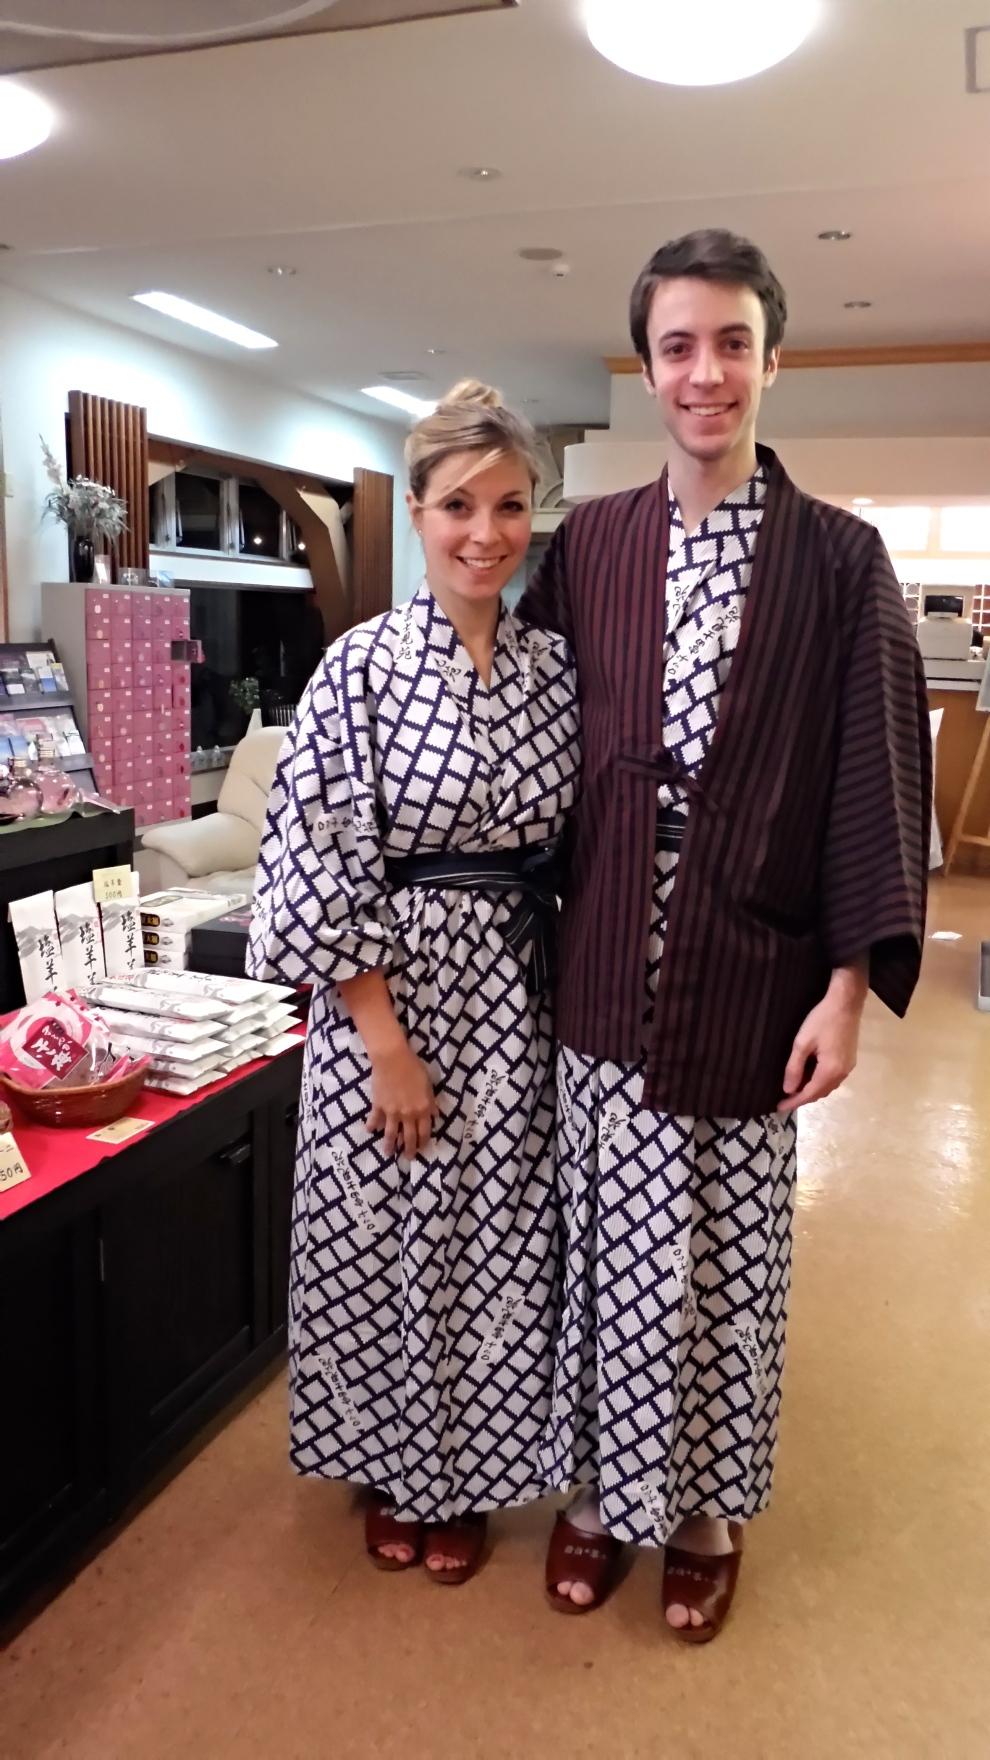 Me & Ari in yukata robes